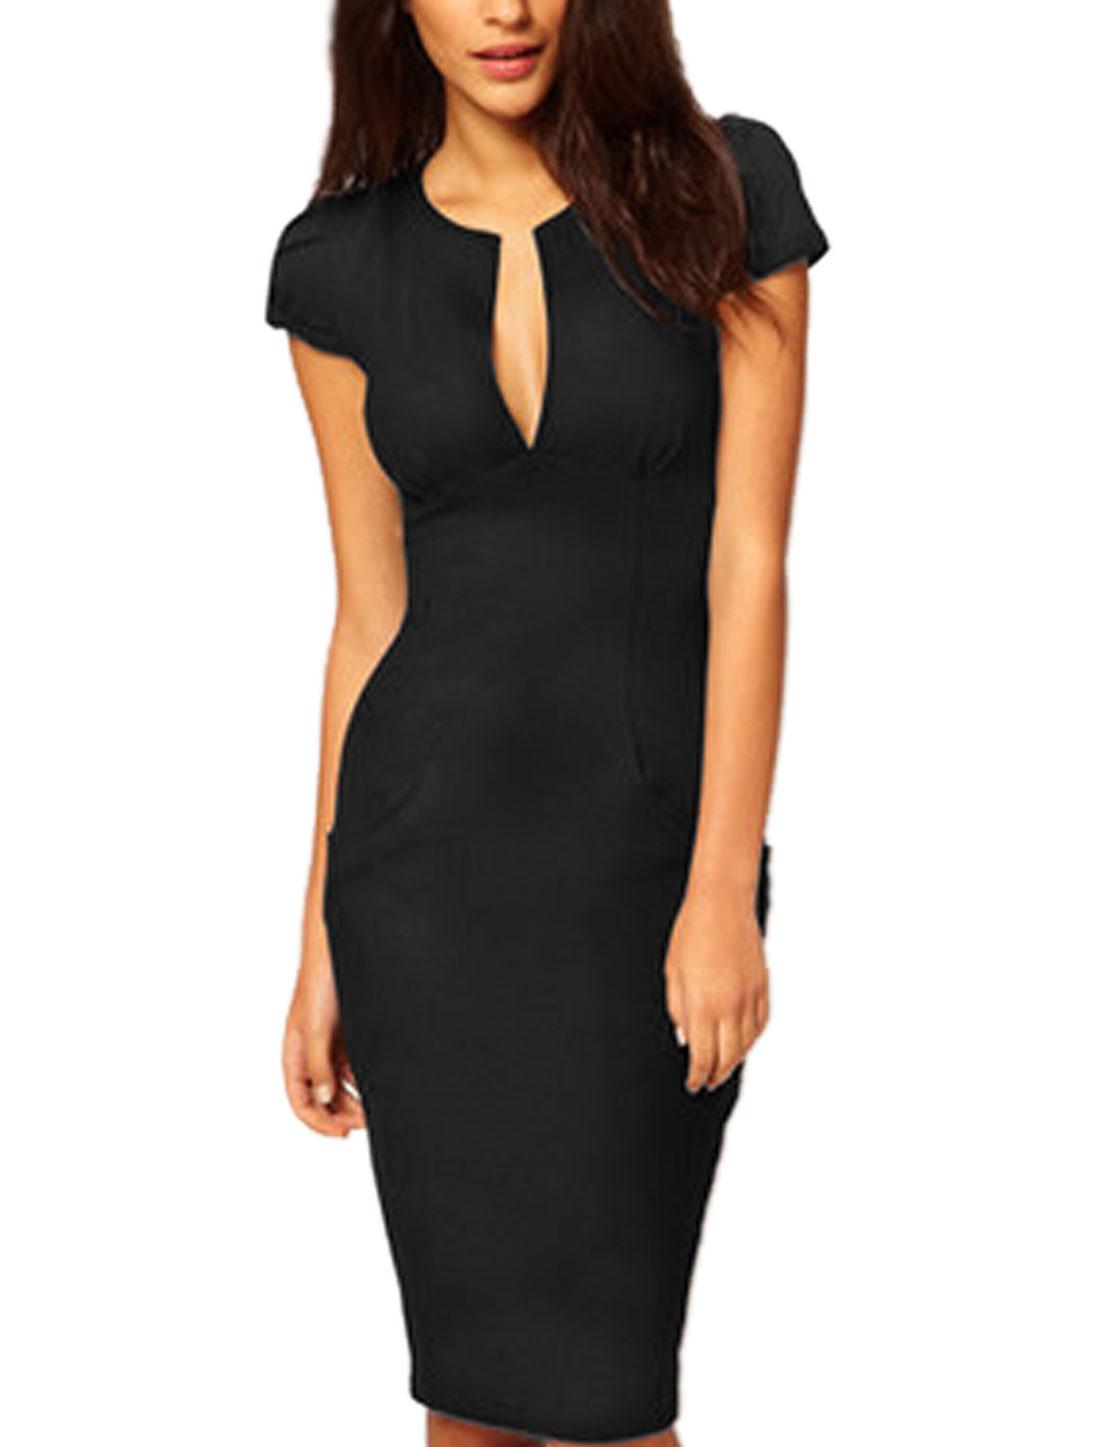 Women Split Neck Cap Sleeves Sheath Dress Black XS